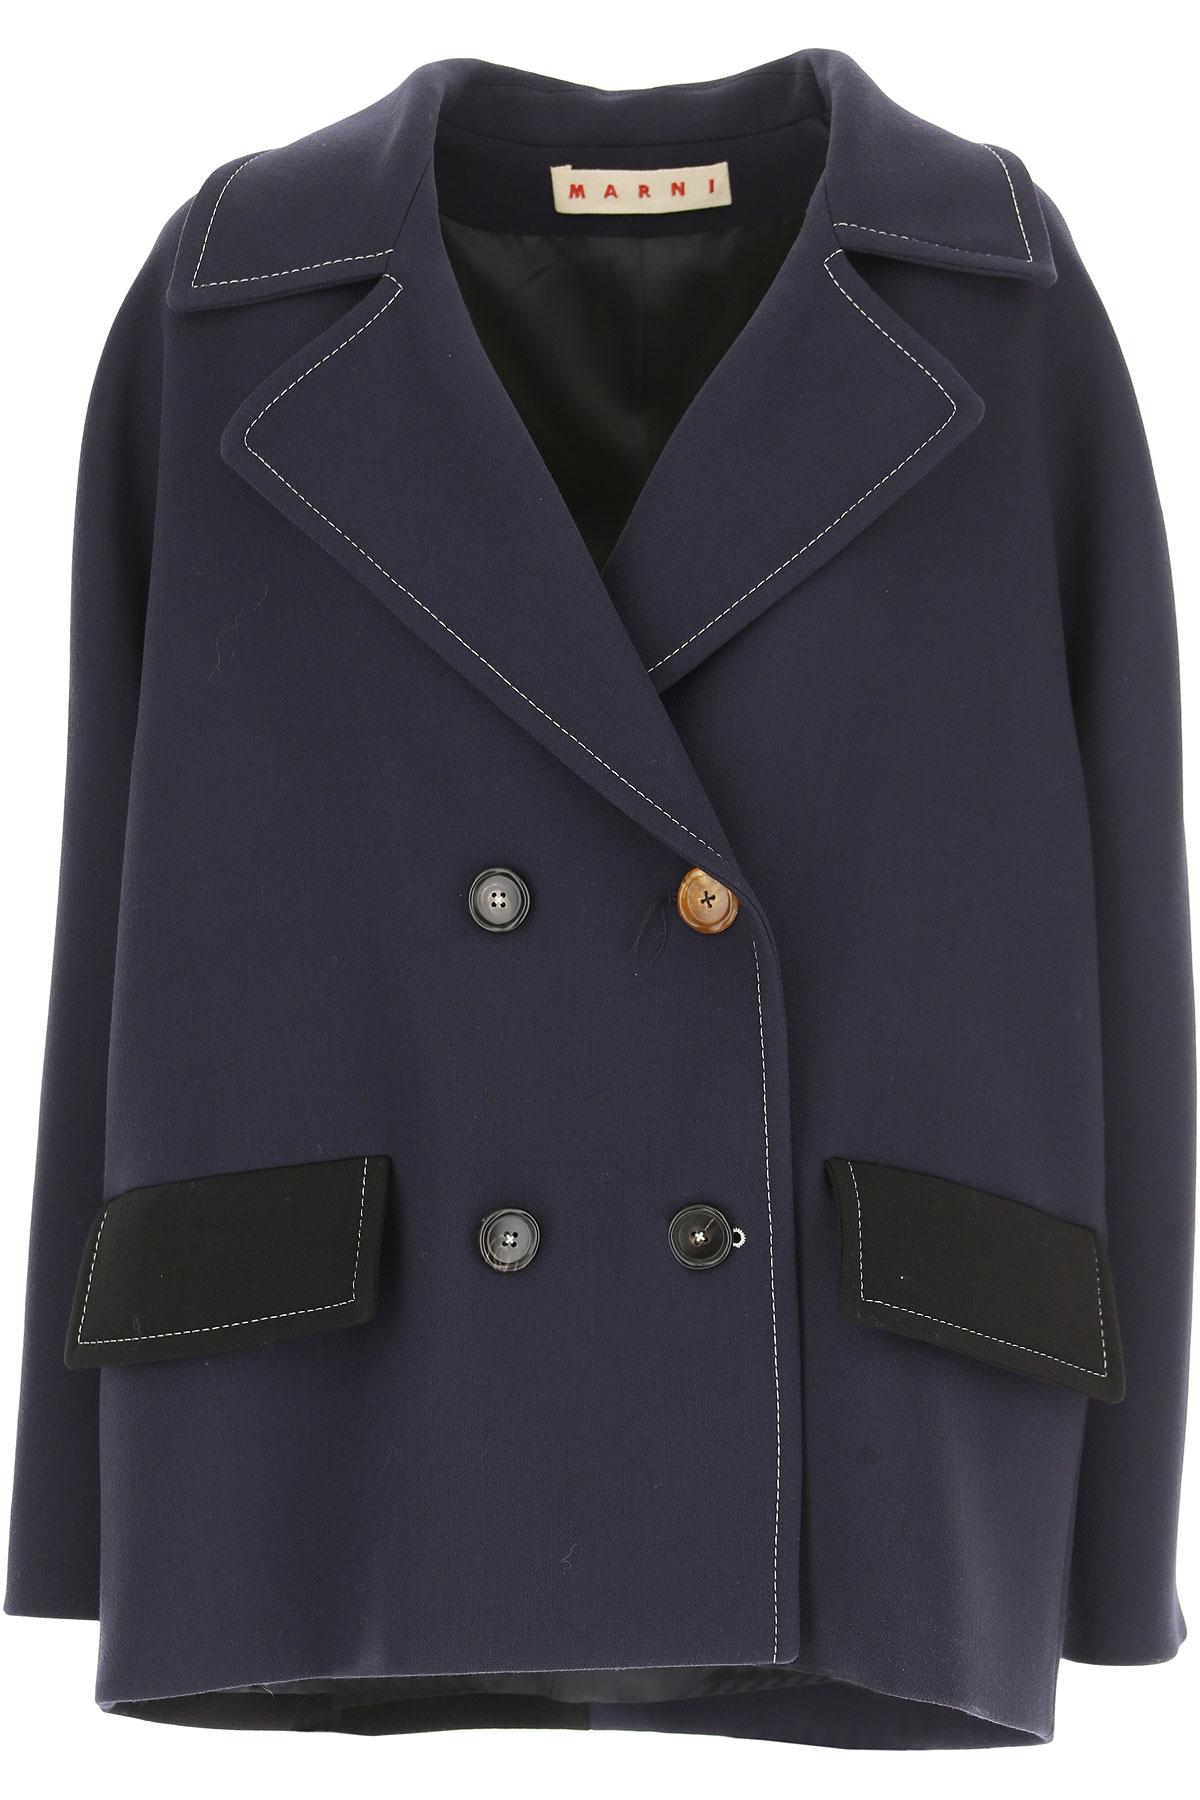 Image of Marni Women\'s Coat, Navy Blue, Virgin wool, 2017, 4 6 8